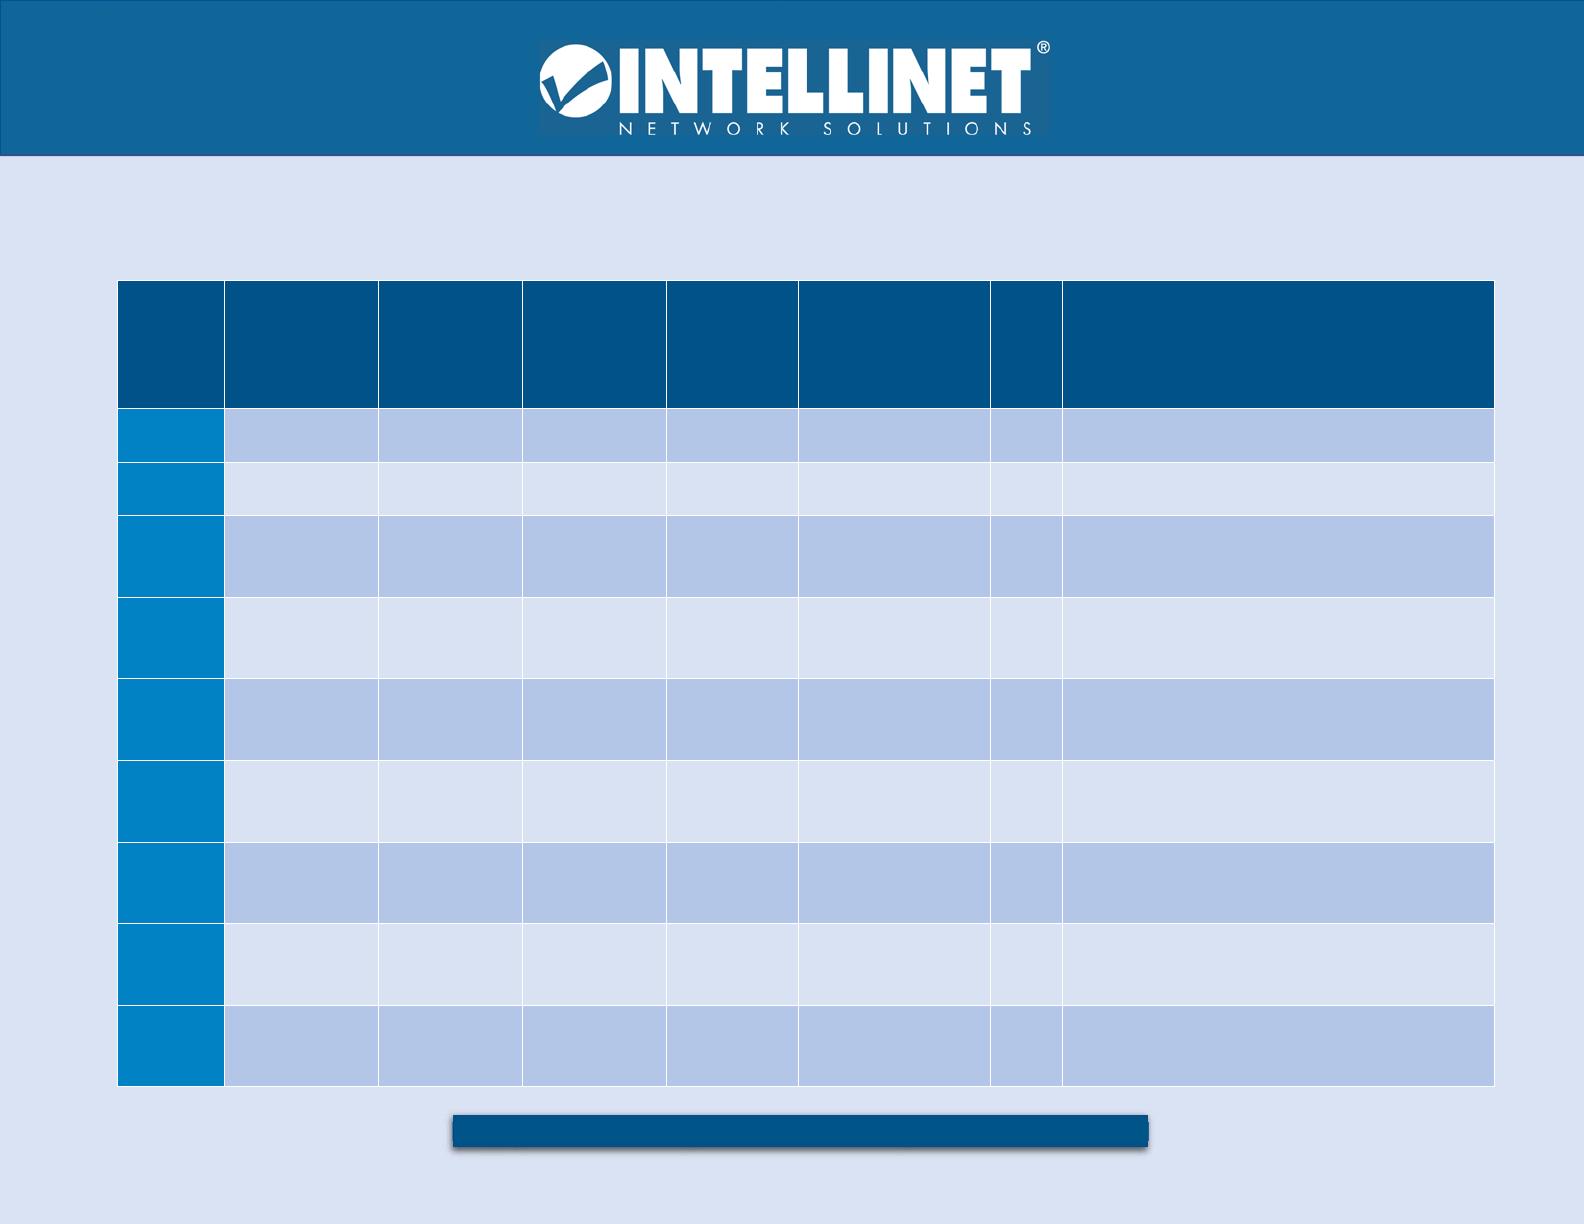 Intellinet_SFP_chart_december_2017x Intellinet SFP Chart